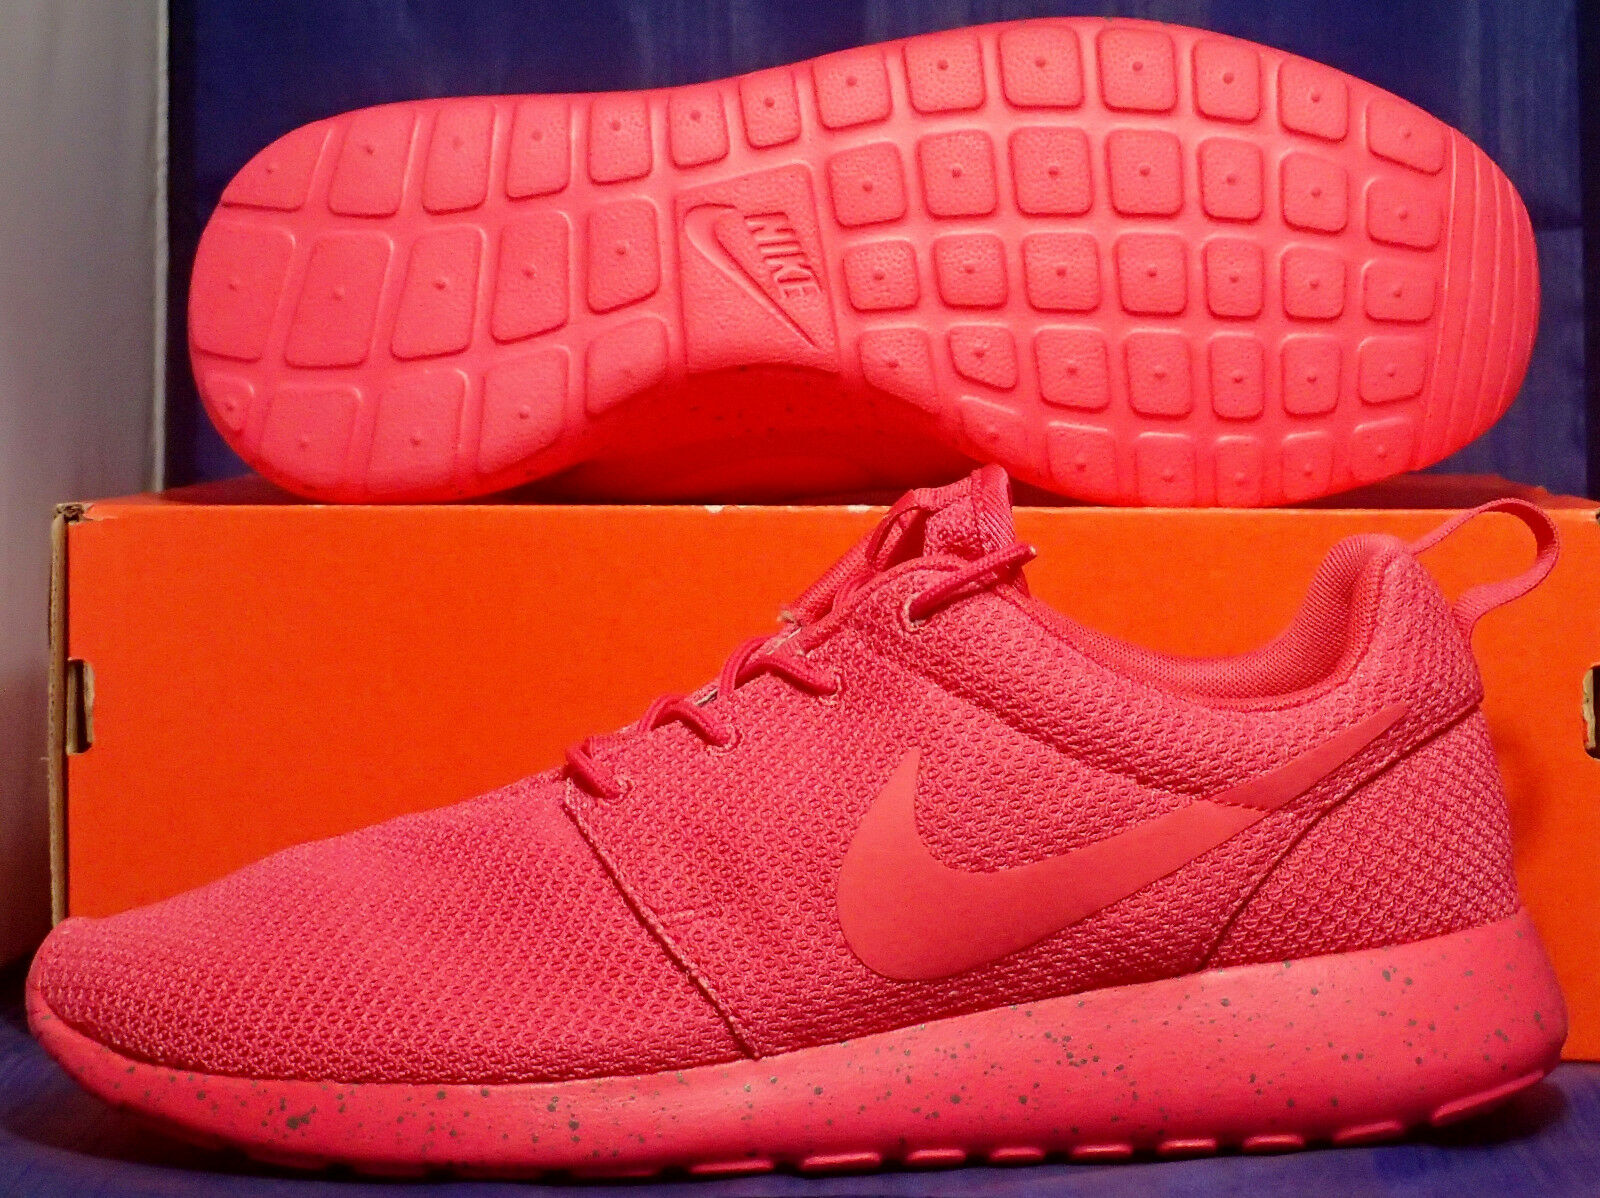 Nike Rosherun iD Red October Grey SZ 10 ( 616834-993 )